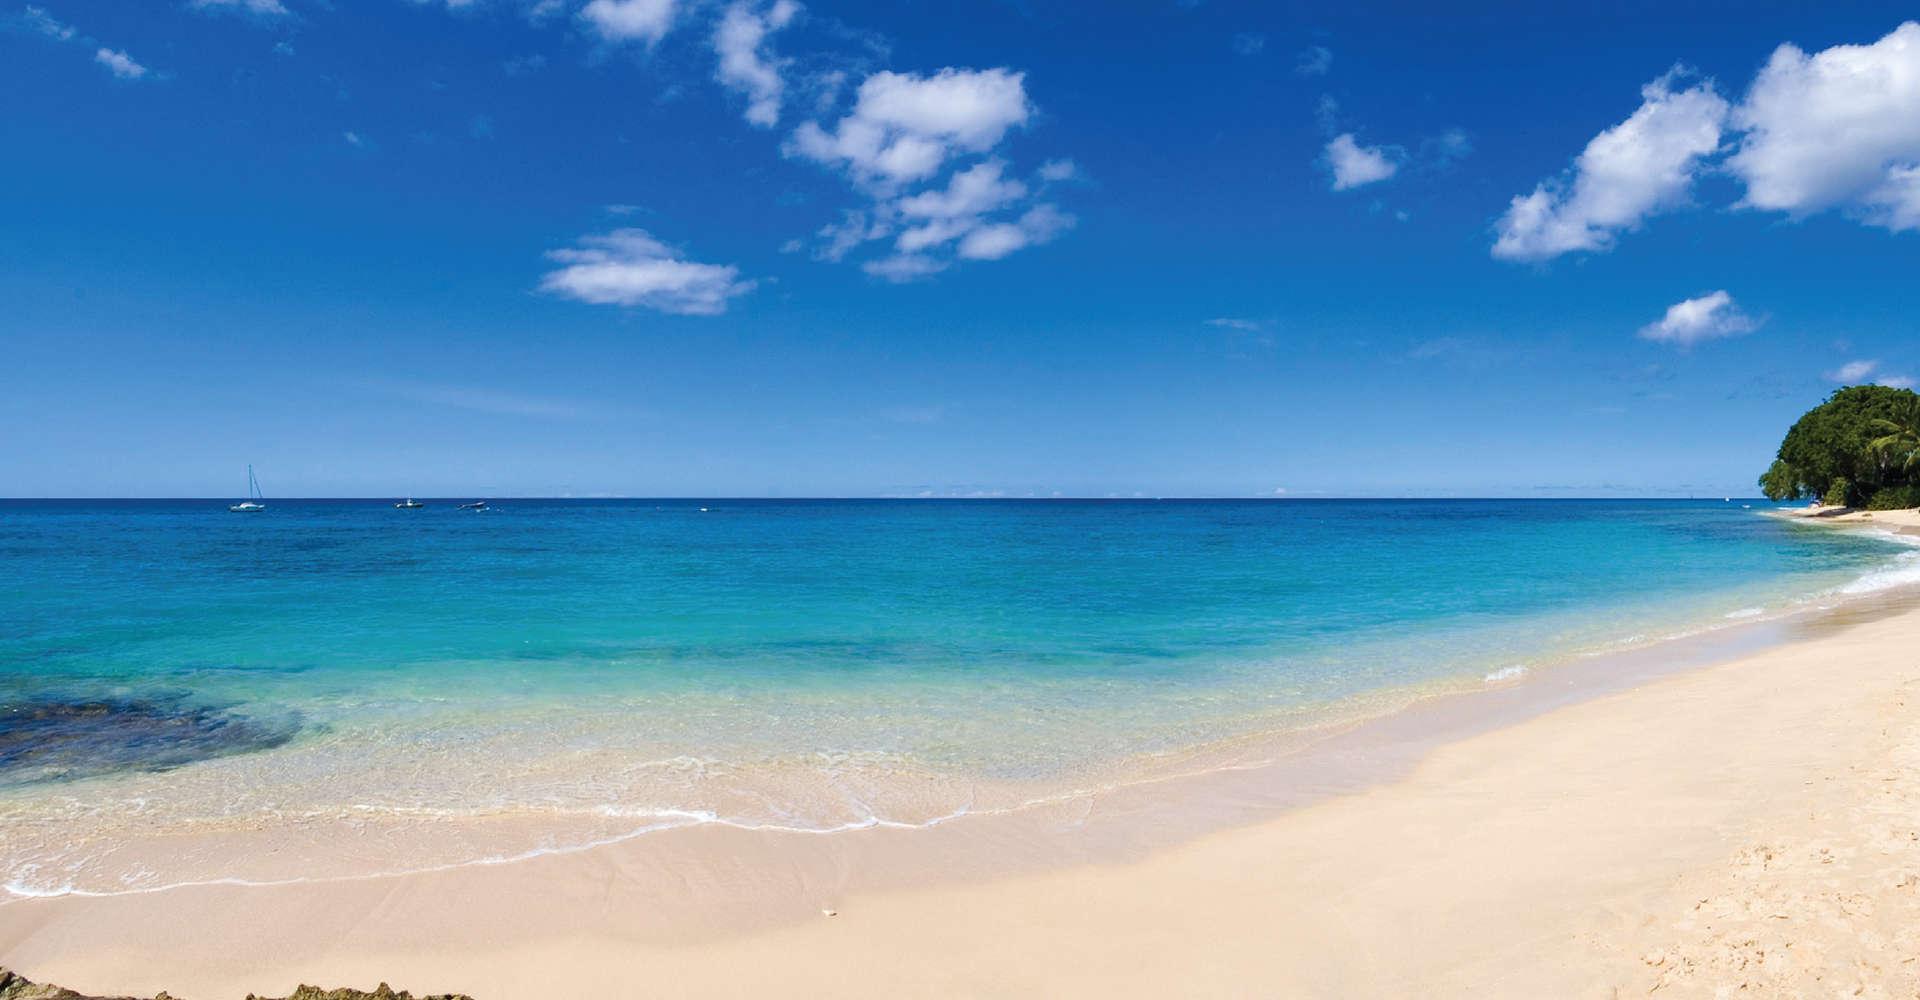 beach with bright blue sea